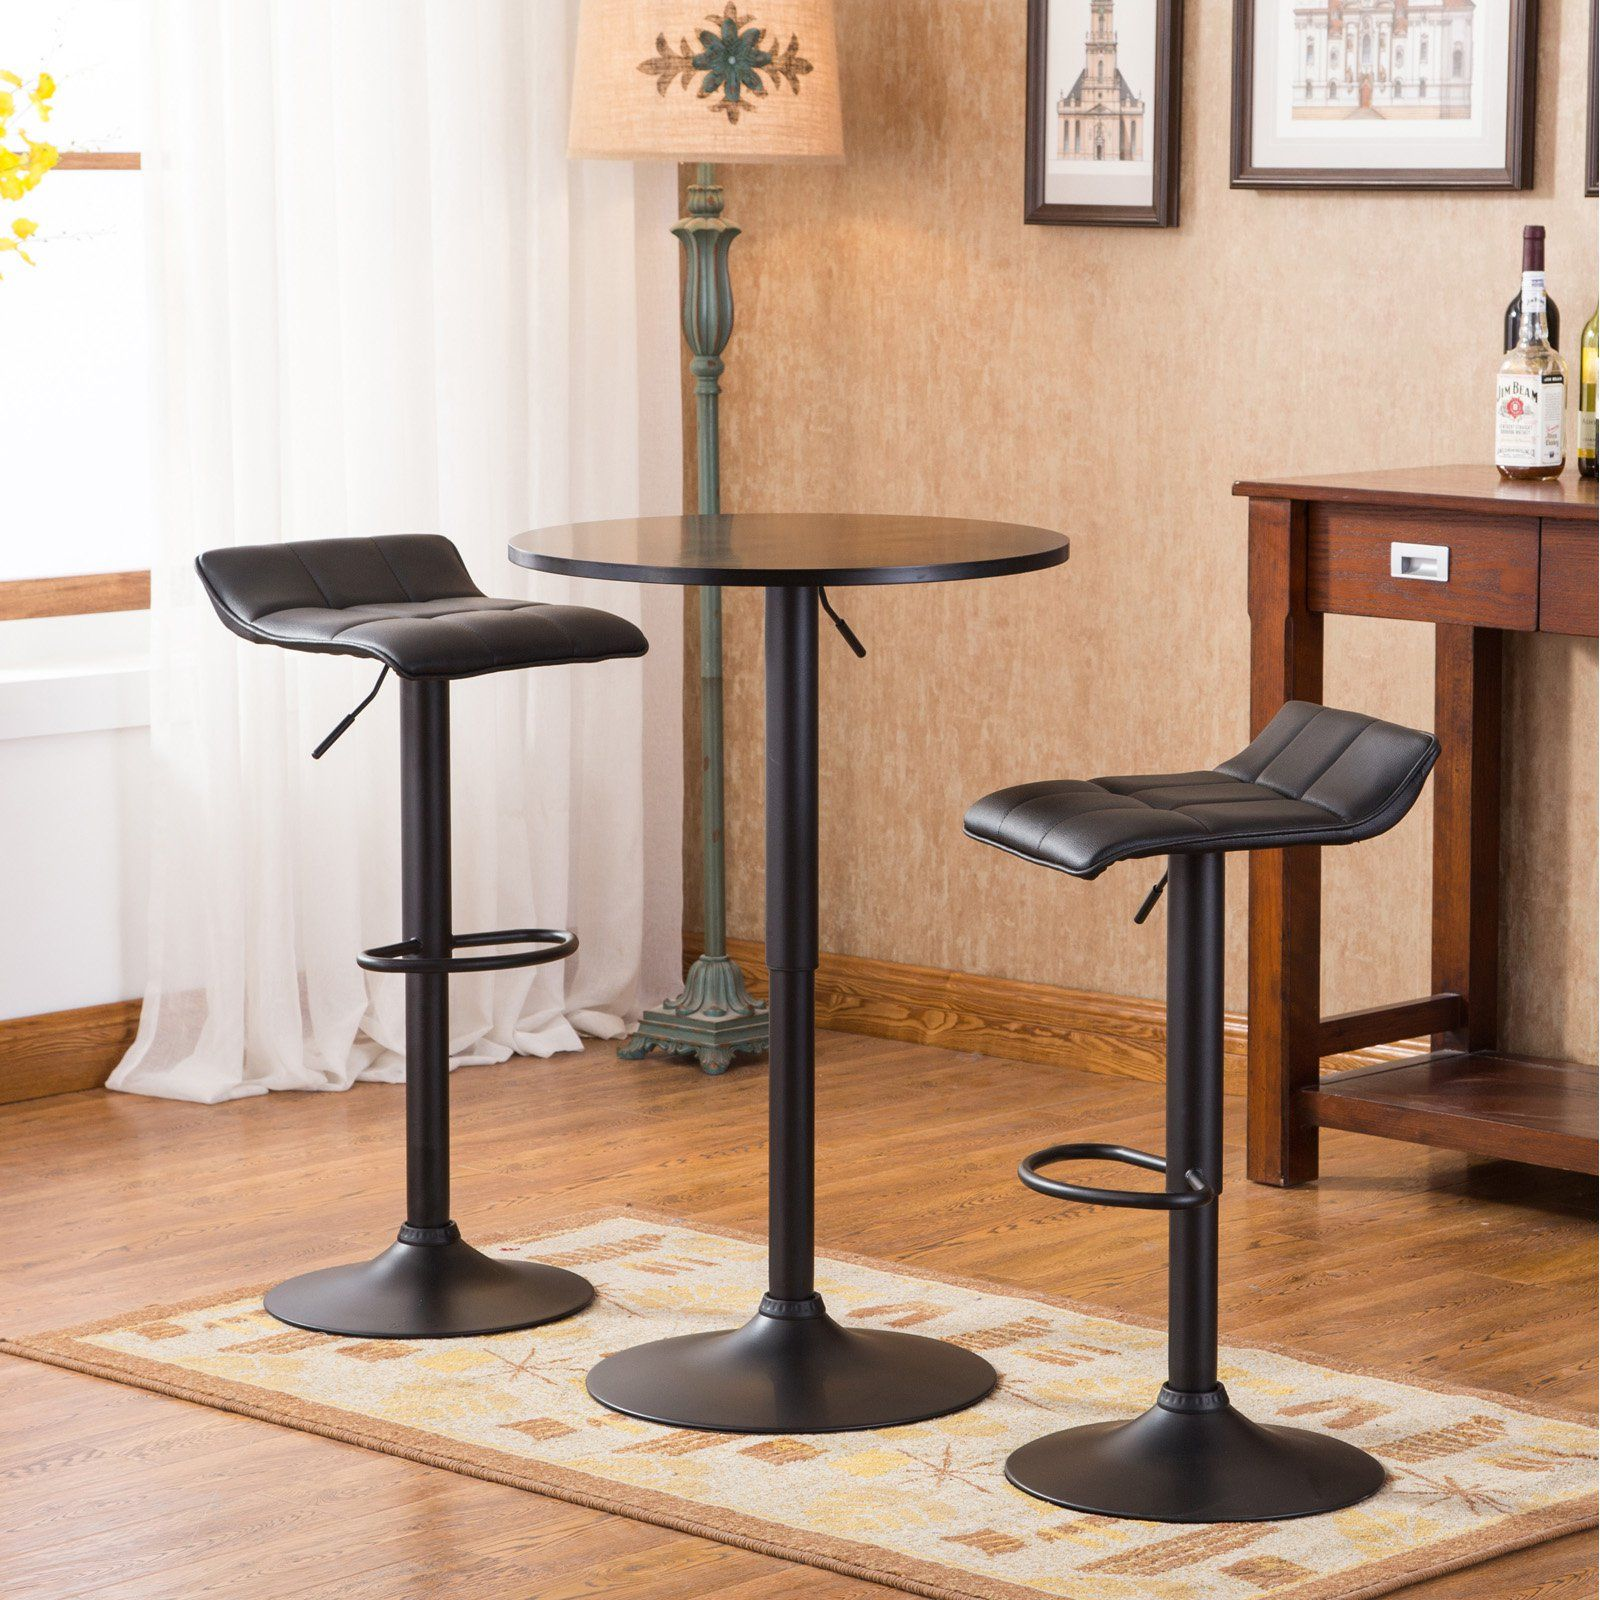 Roundhill Furniture Belham Round Top Adjustable Height Bar